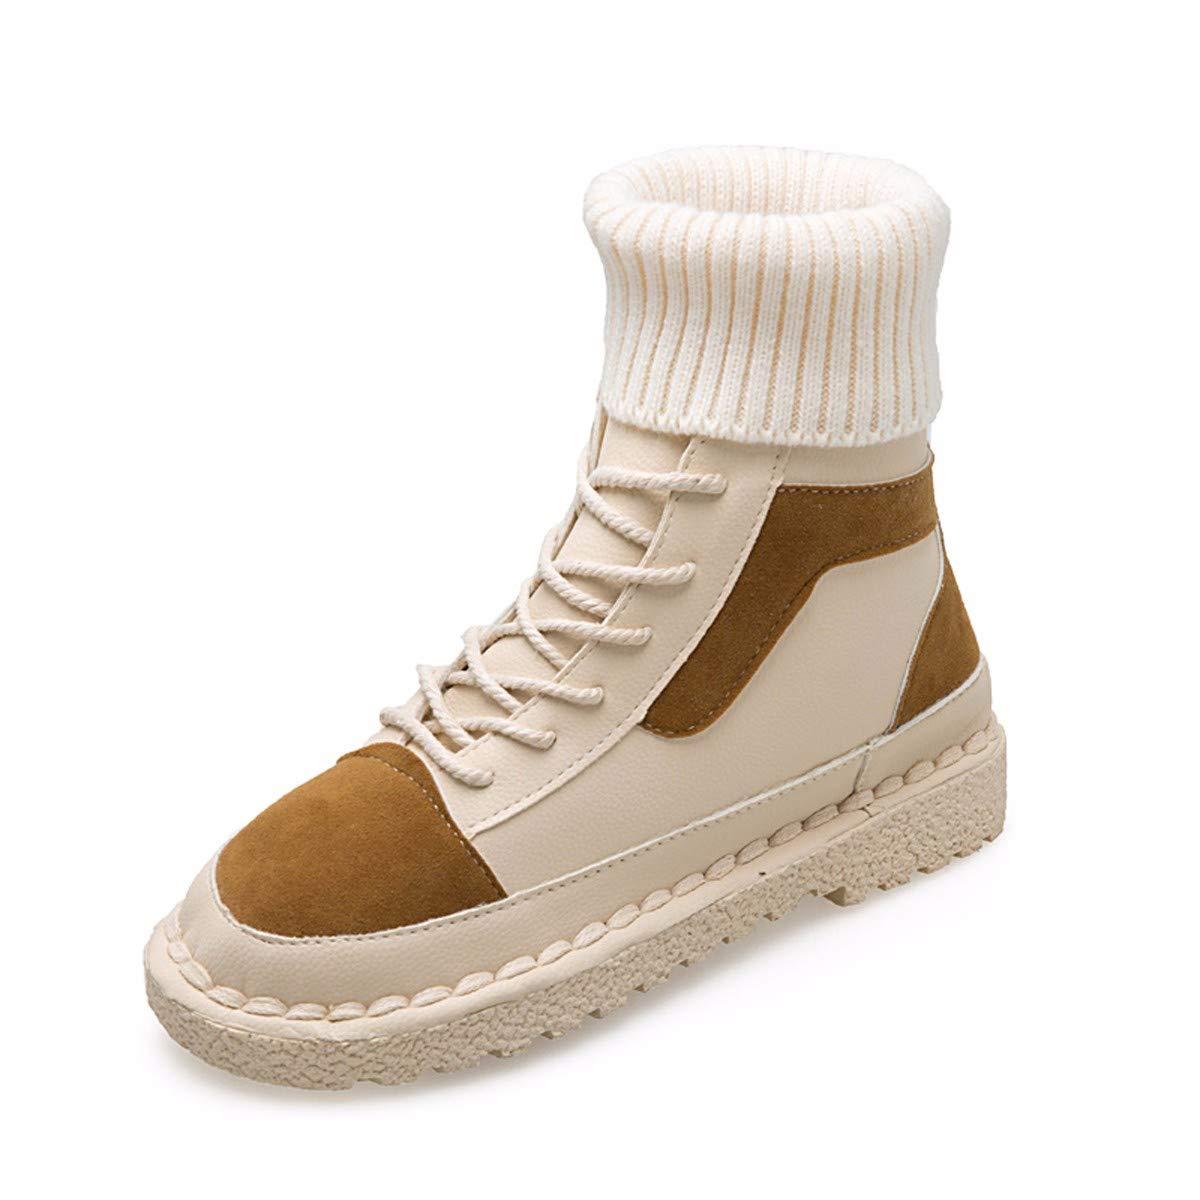 KPHY Damenschuhe Martin Stiefel Sport Hohe Hohe Hohe Schuhe Wilde Stiefel Kurze Stiefel SAMT Flachen Boden Stiefeln Frauen - Stiefel. f5d8ac